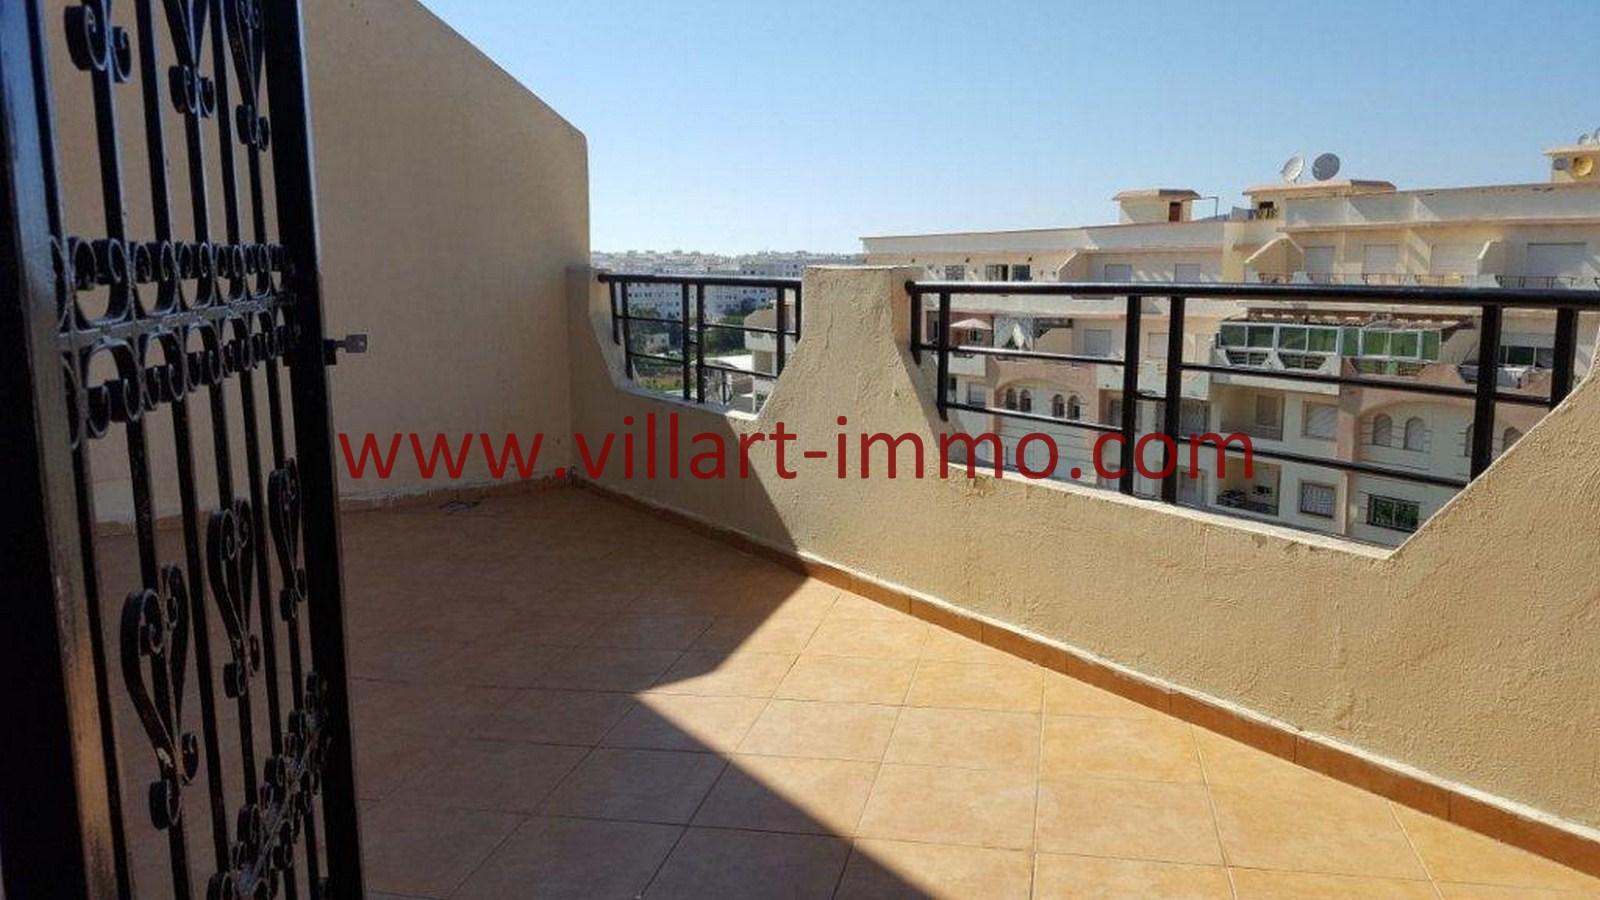 8-Vente-Appartement-Tanger-Terrasse-VA509-Villart Immo